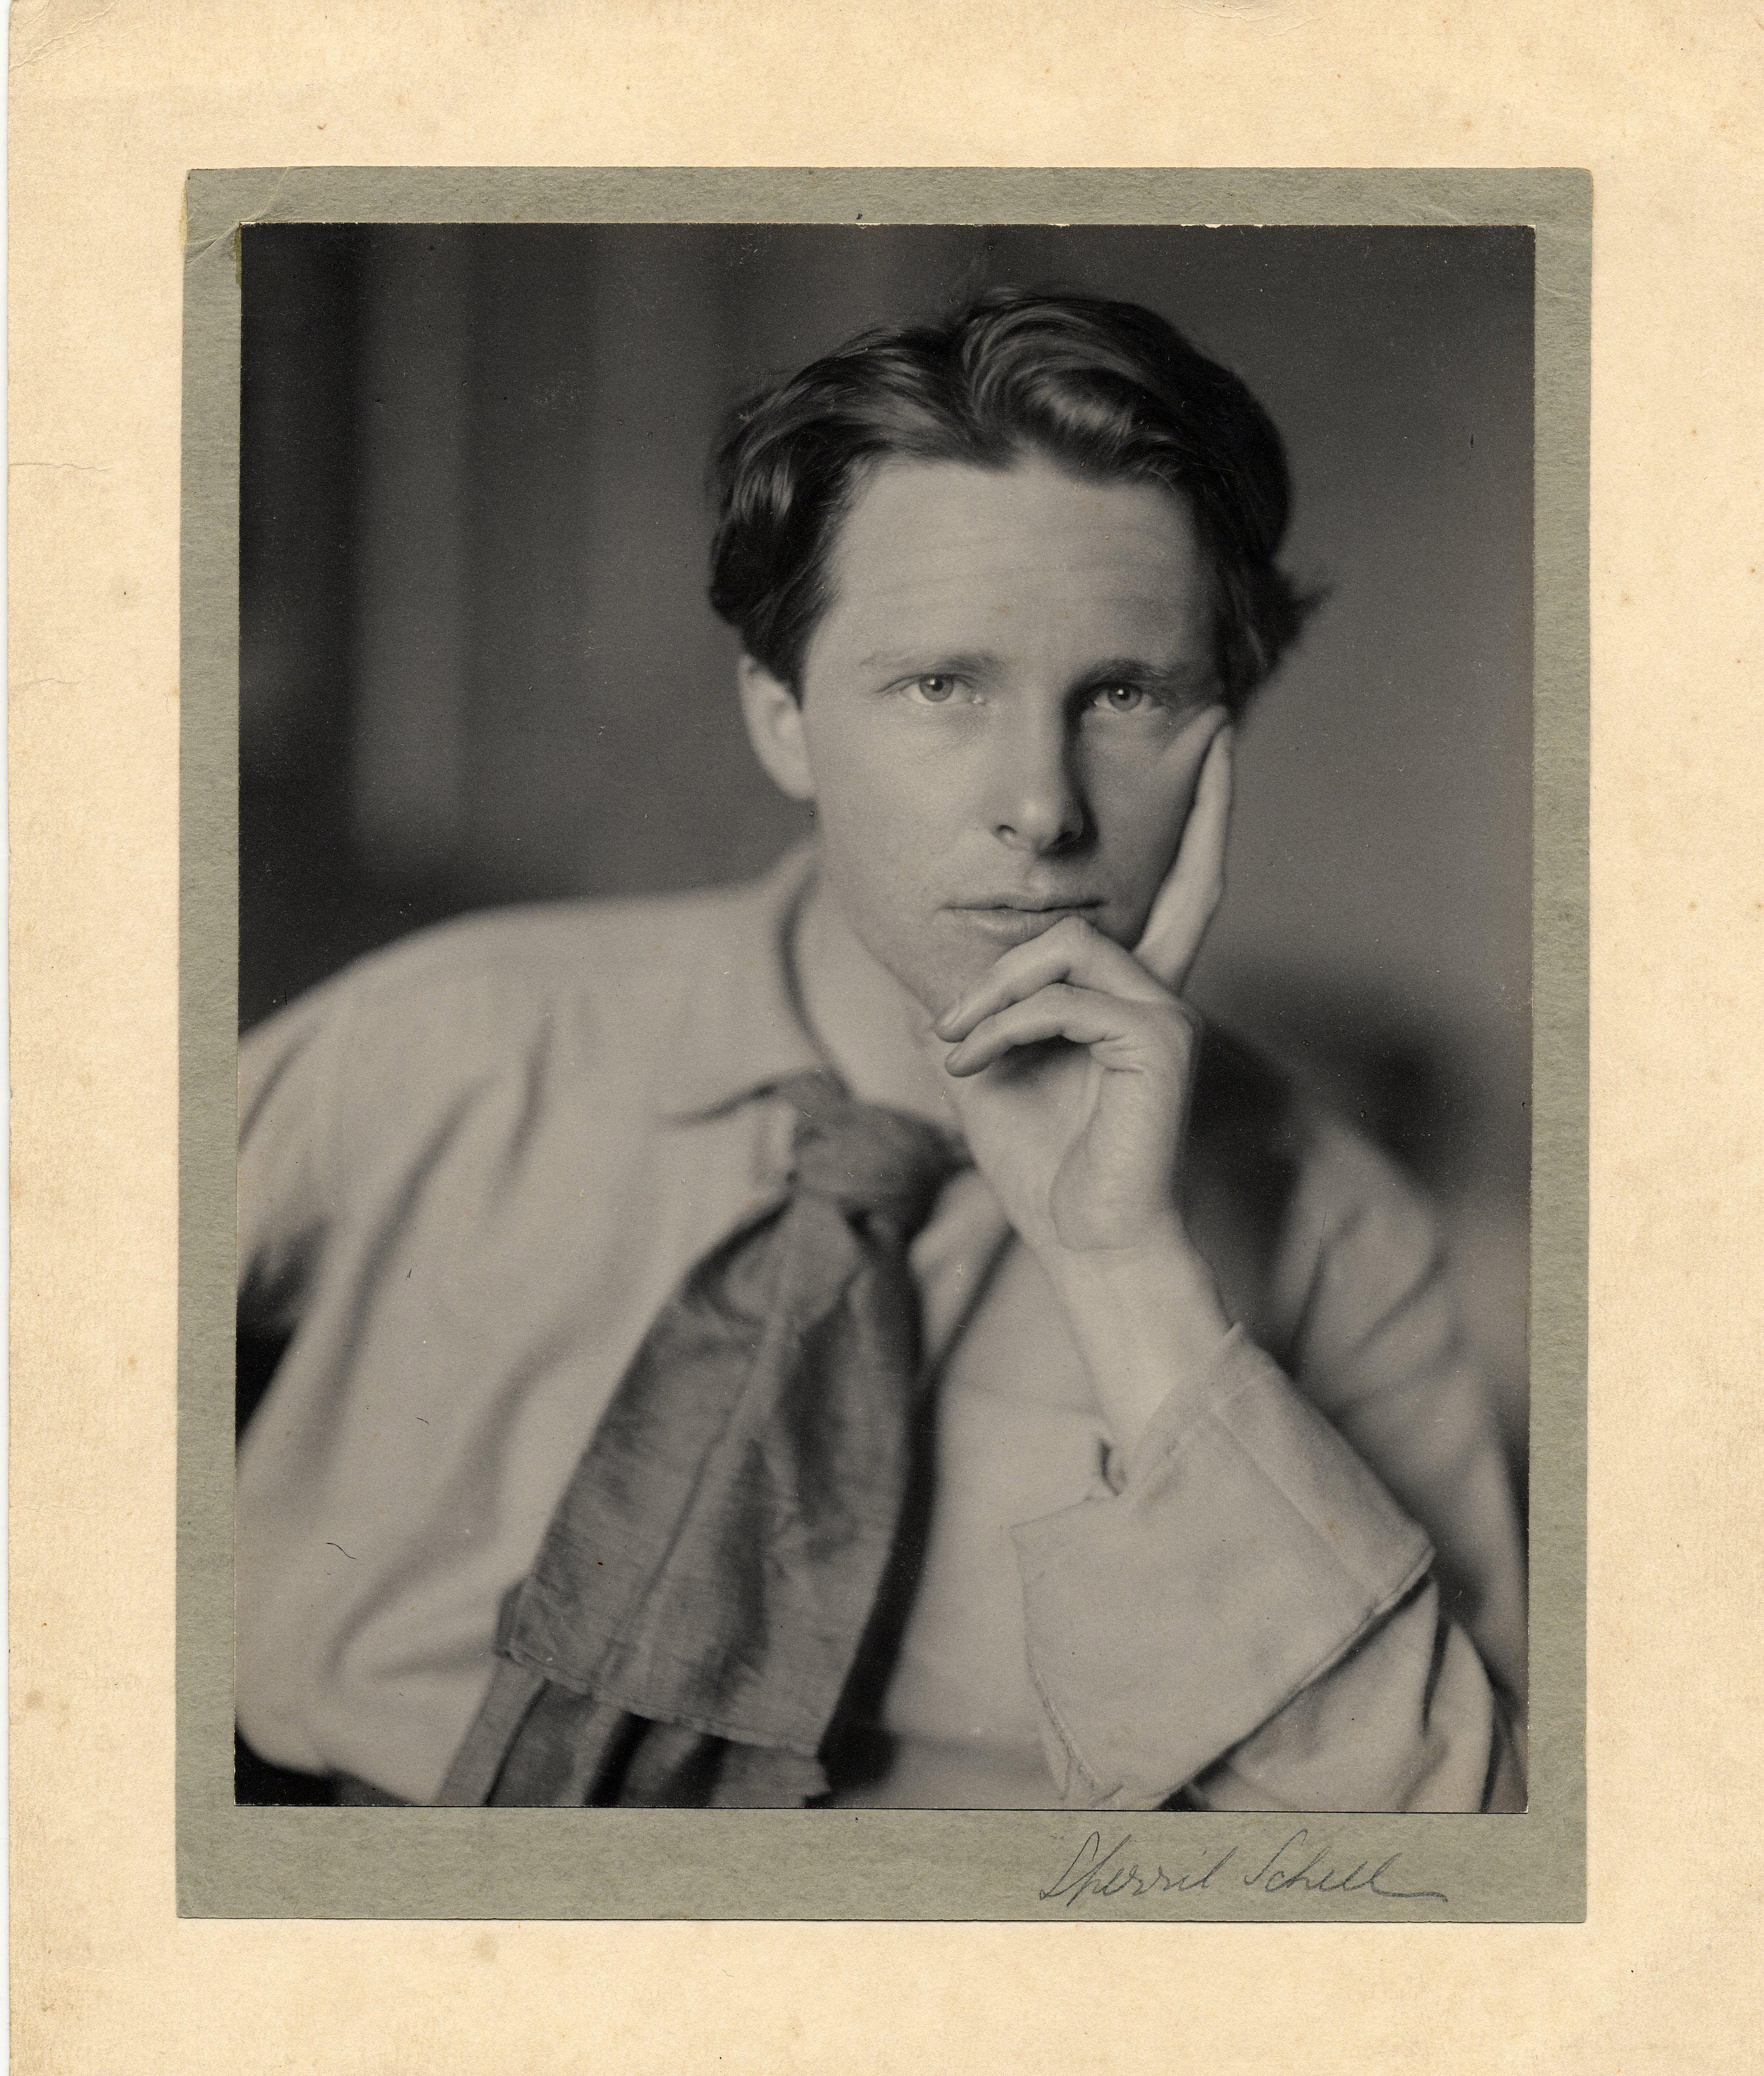 Studio portrait of Rupert Brooke, taken by Sherril Schell, April 1913 (RCB/Ph/178)